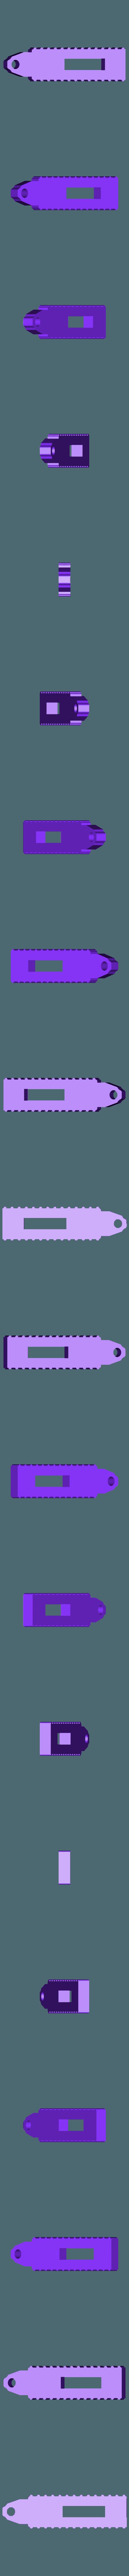 Head.stl Download free STL file Funky turtle keychain • 3D print design, DK7